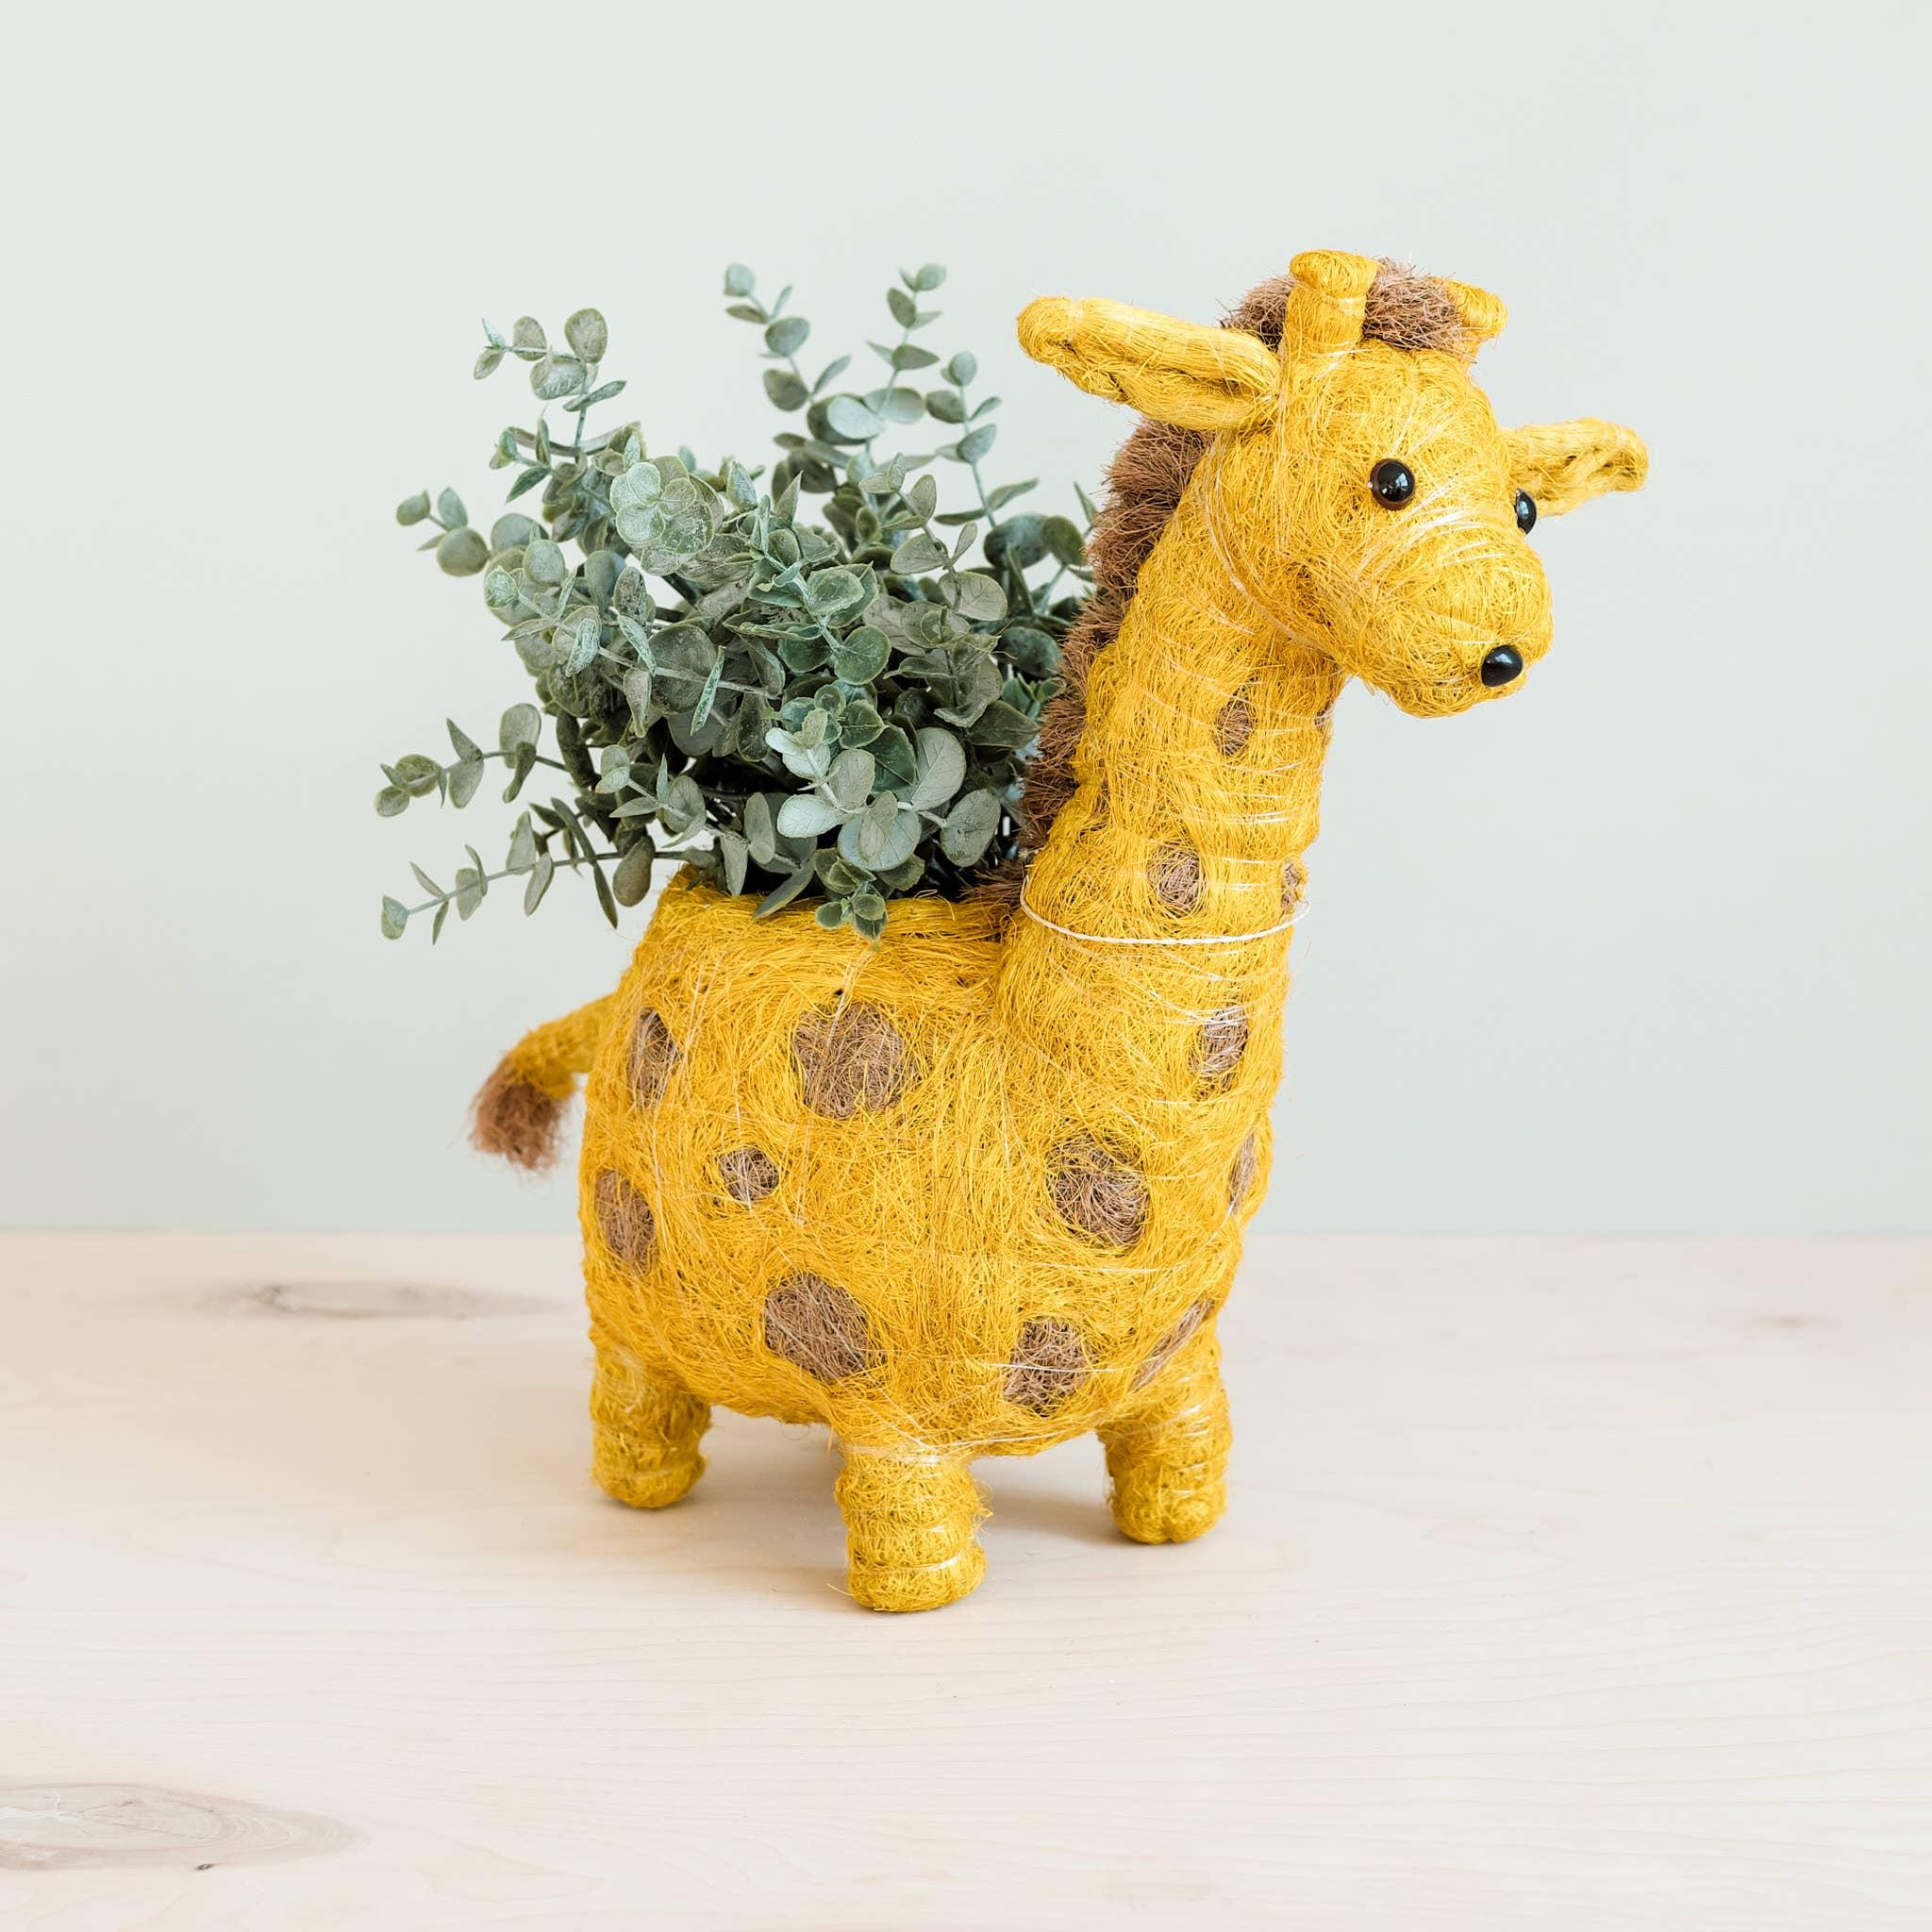 Animal Planter - Giraffe | Trada Marketplace